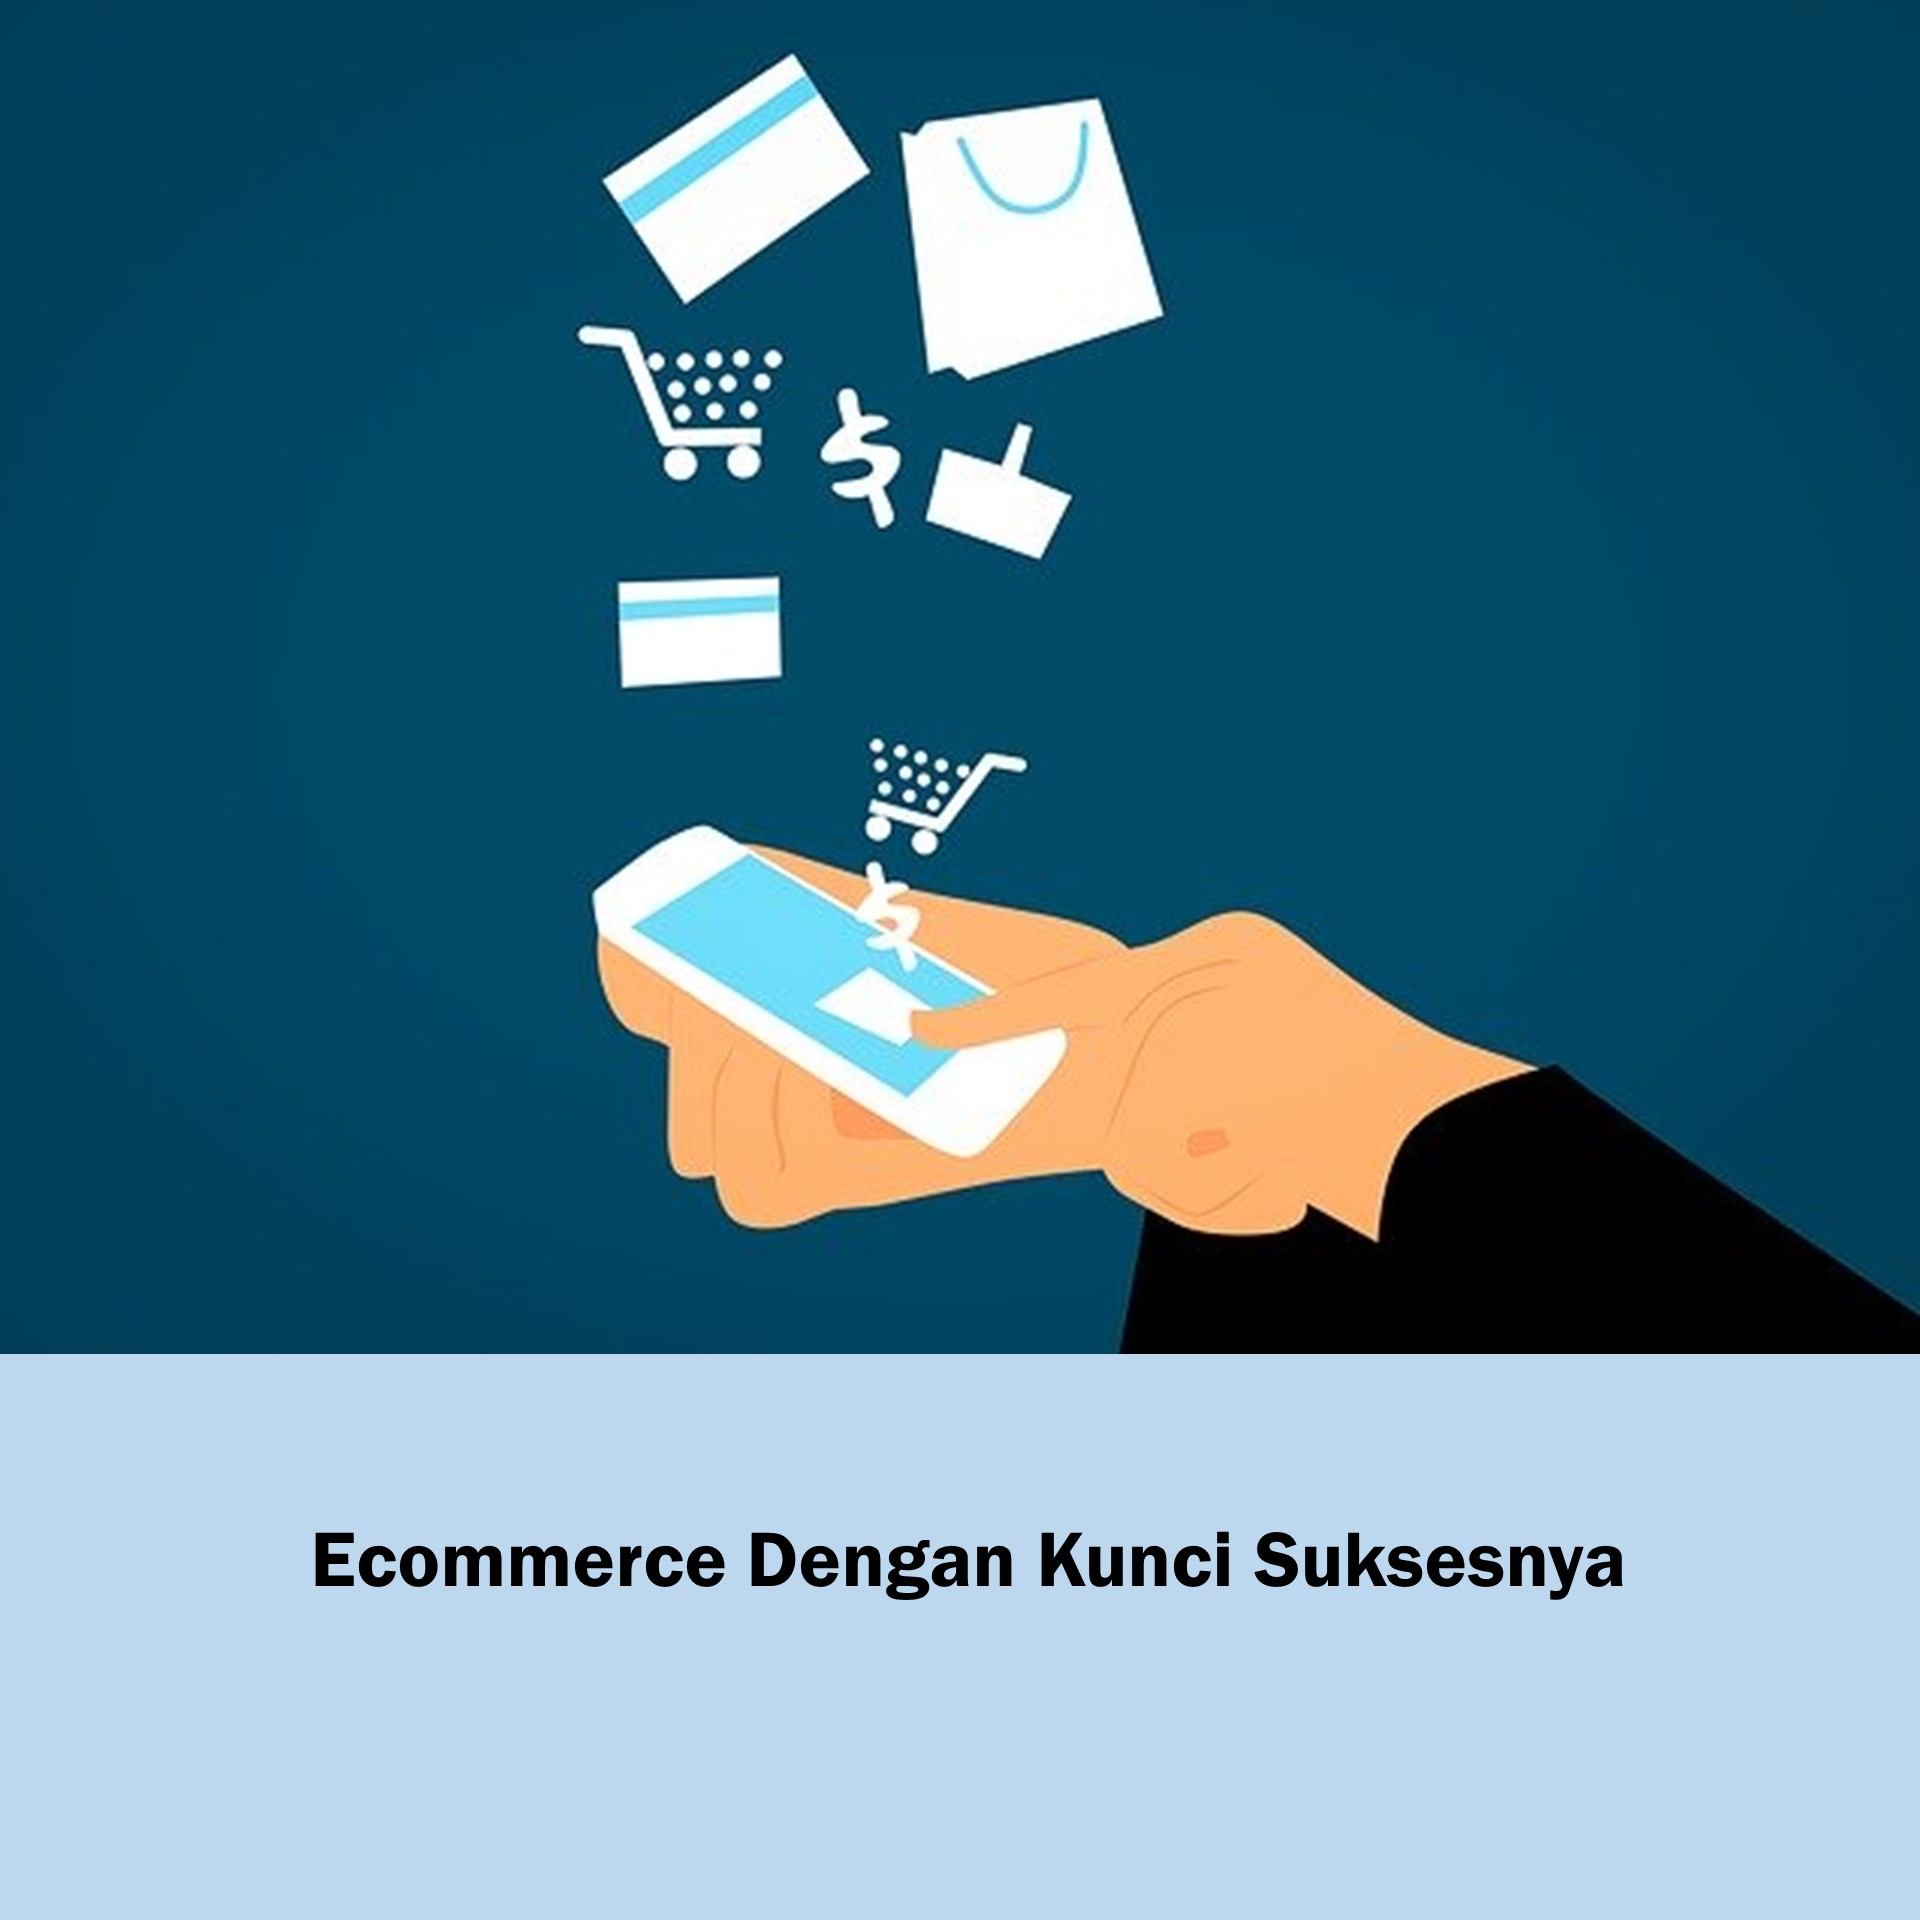 ecommerce dengan kunci kesuksesannya